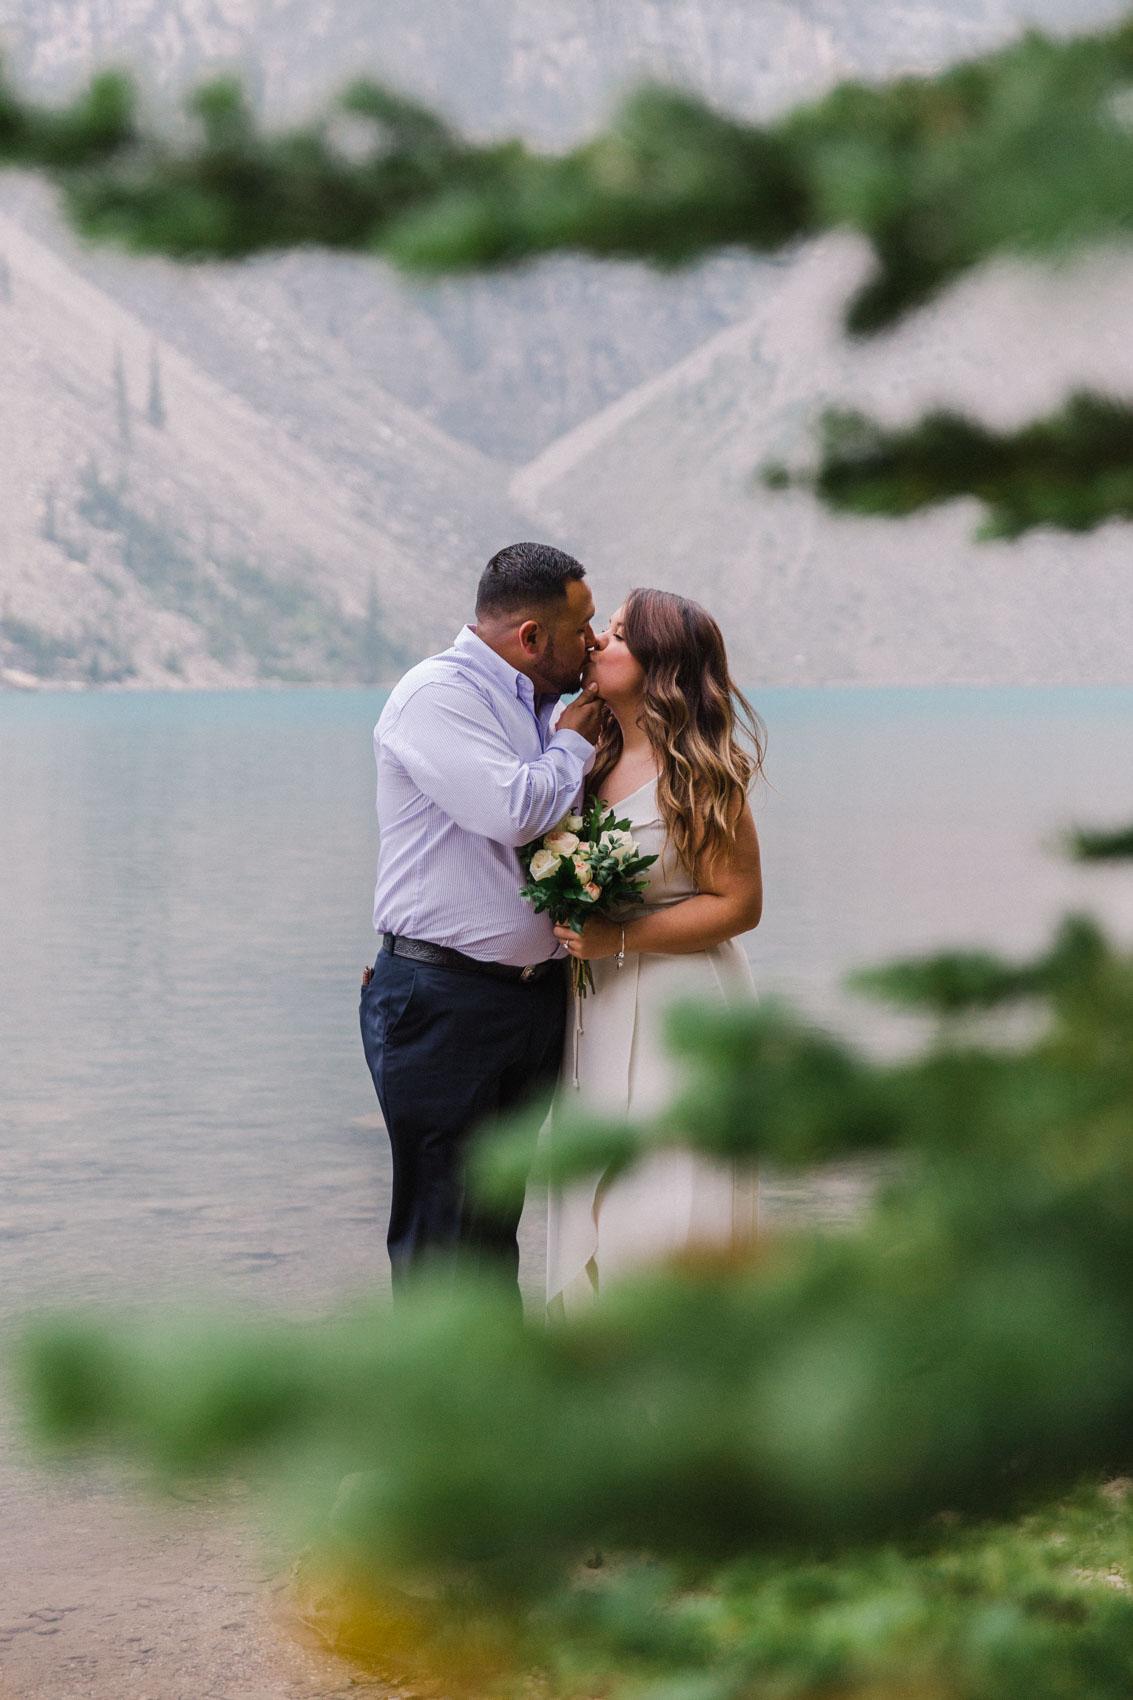 Lake Louise Mountain Engagement Photographer Moraine Lake Wedding Jennie Guenard Photography-7.jpg